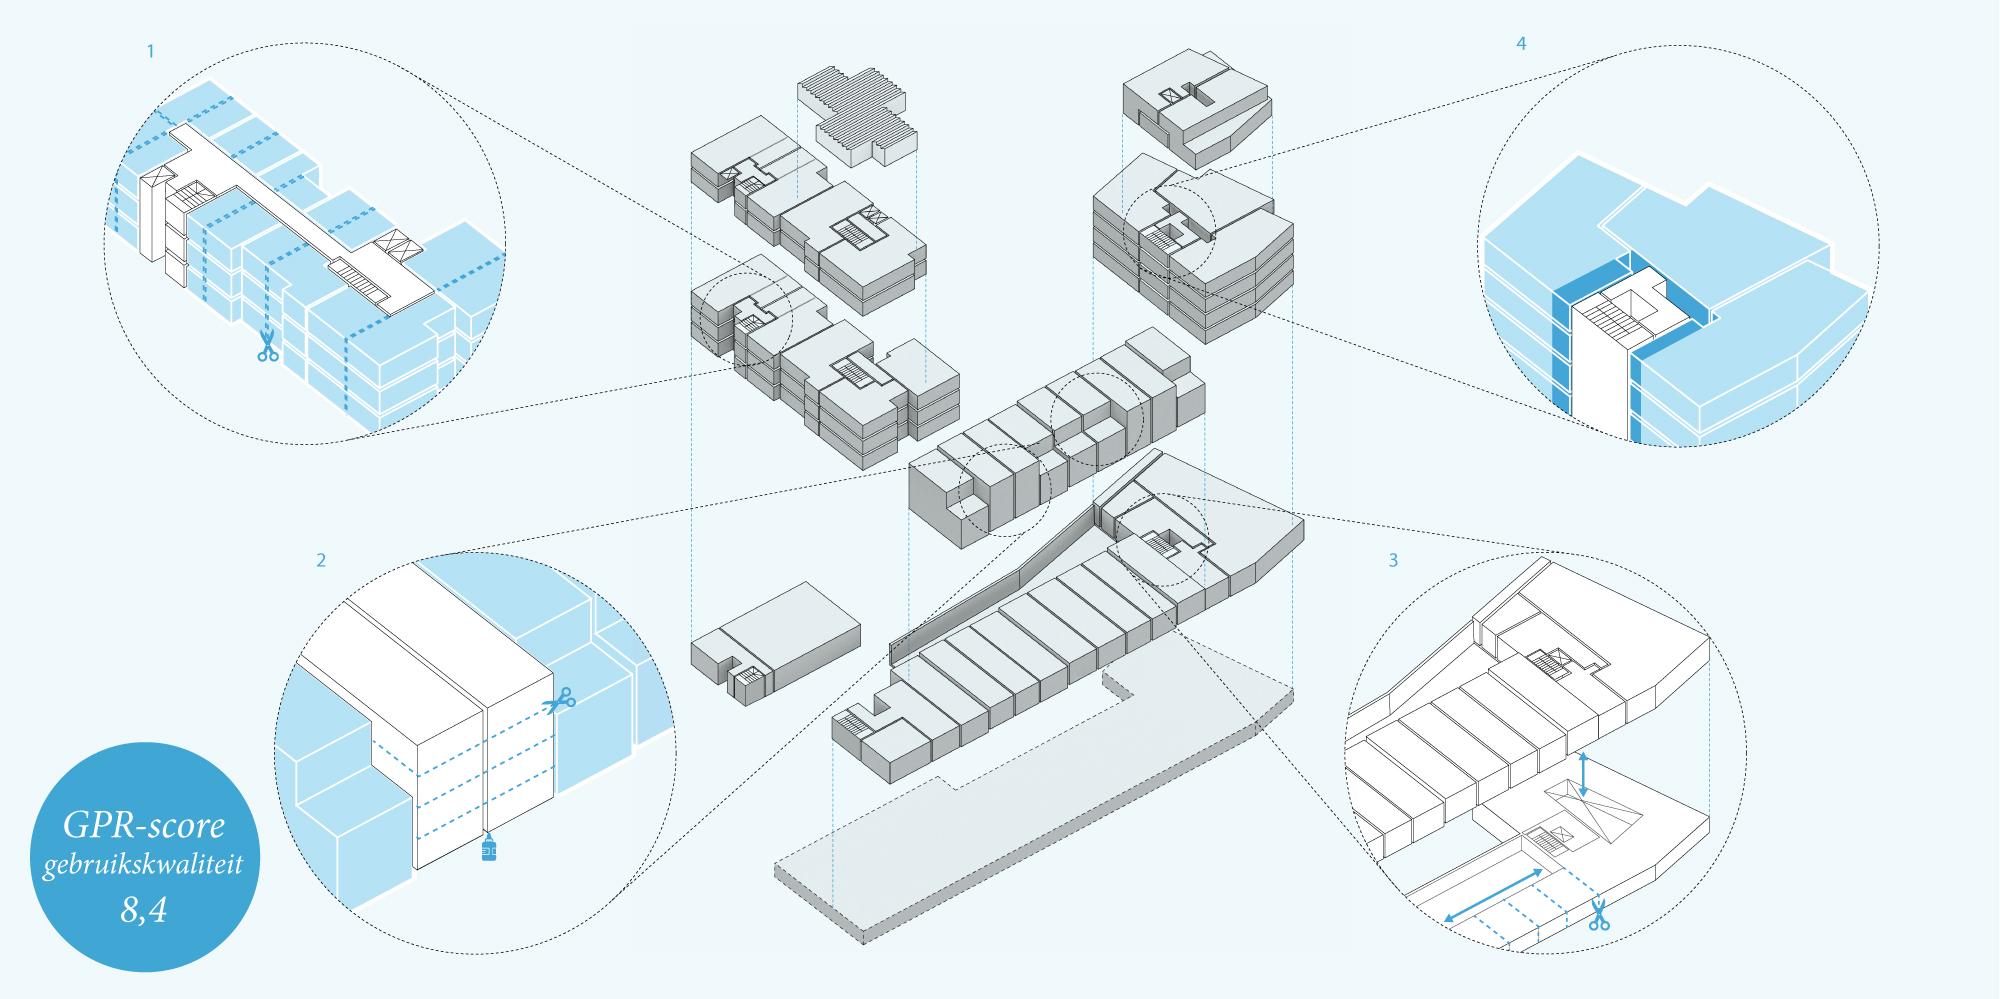 flexibiliteit_woningbouw_gebouw_architectuur_toekomst